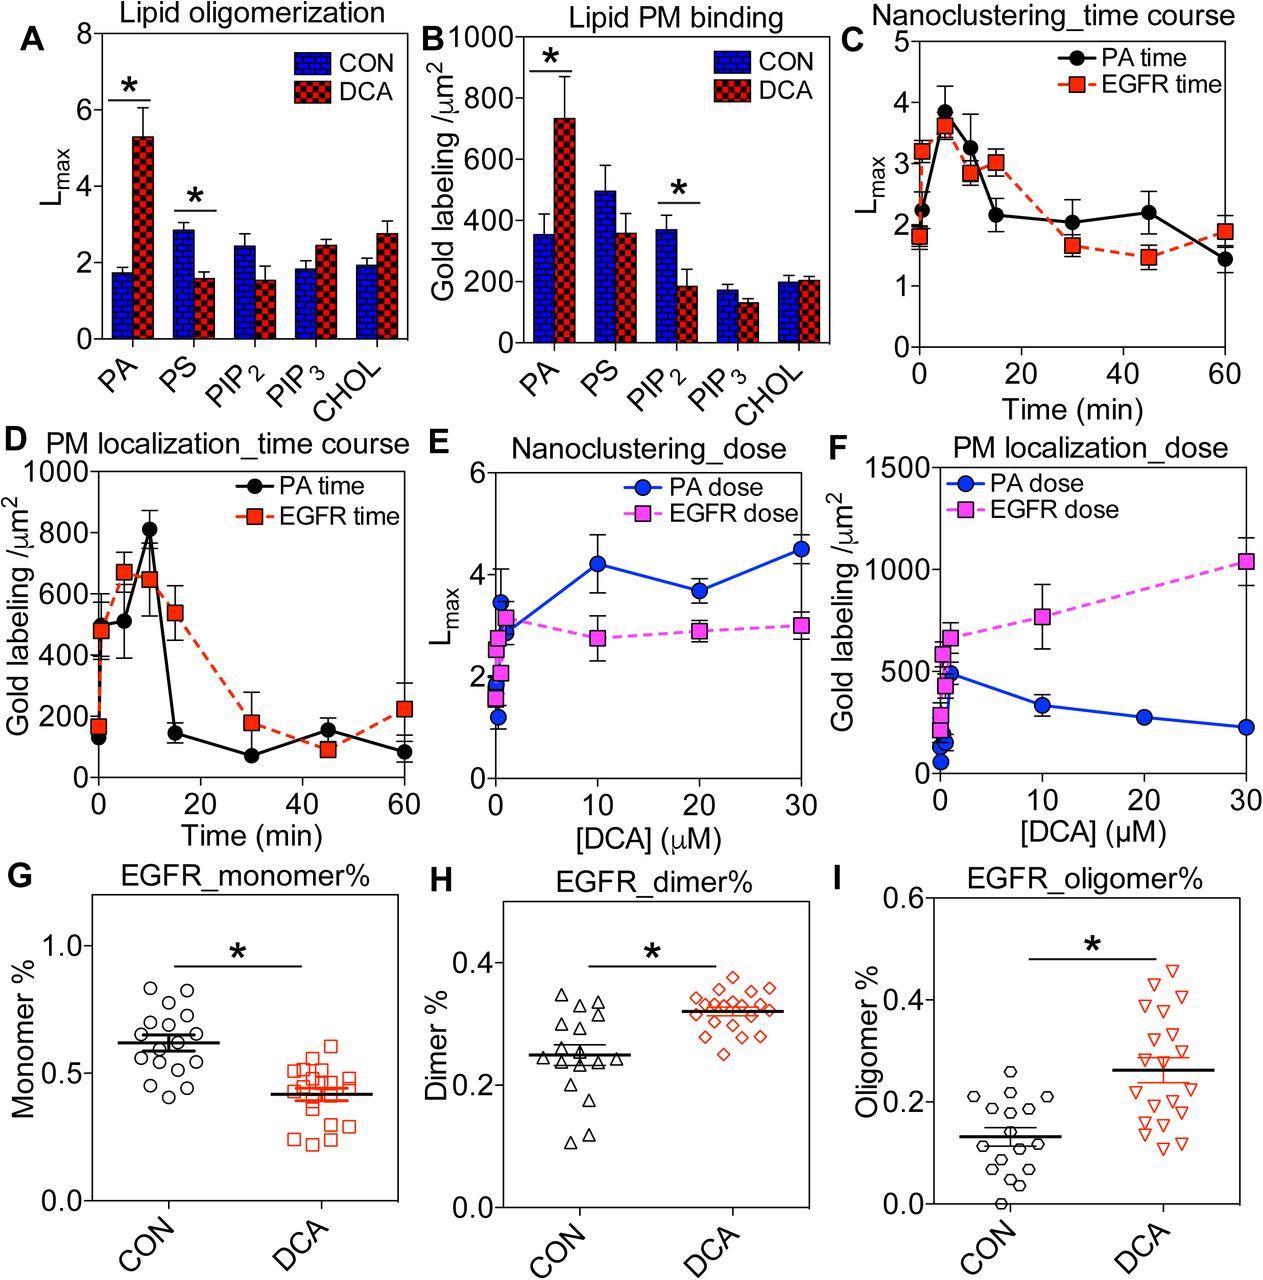 Bile acids target proteolipid nano-assemblies of EGFR and